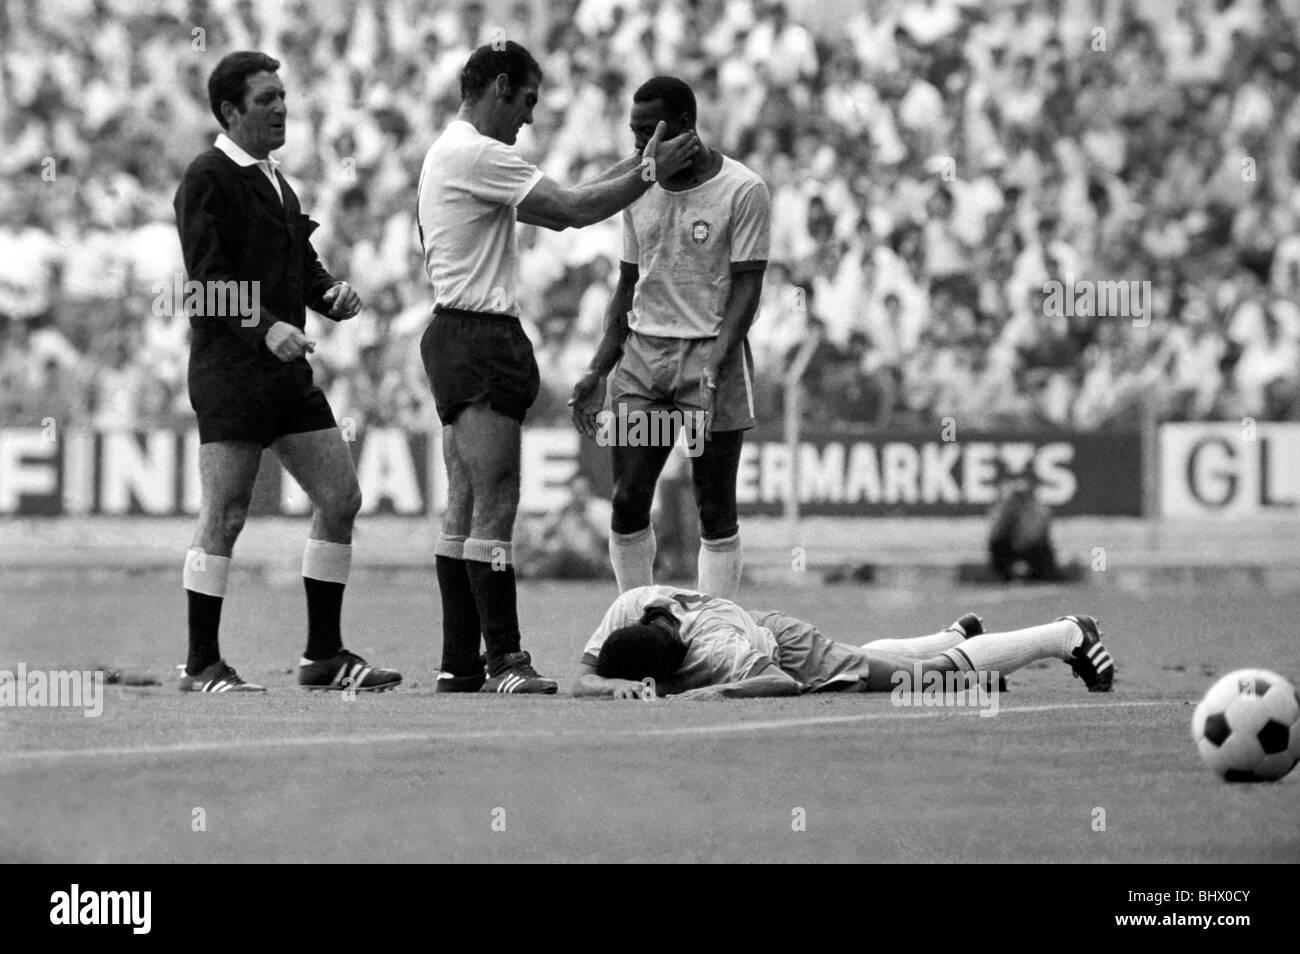 Pele calmed down by Uruguain player whilst felled Jairzinho lies